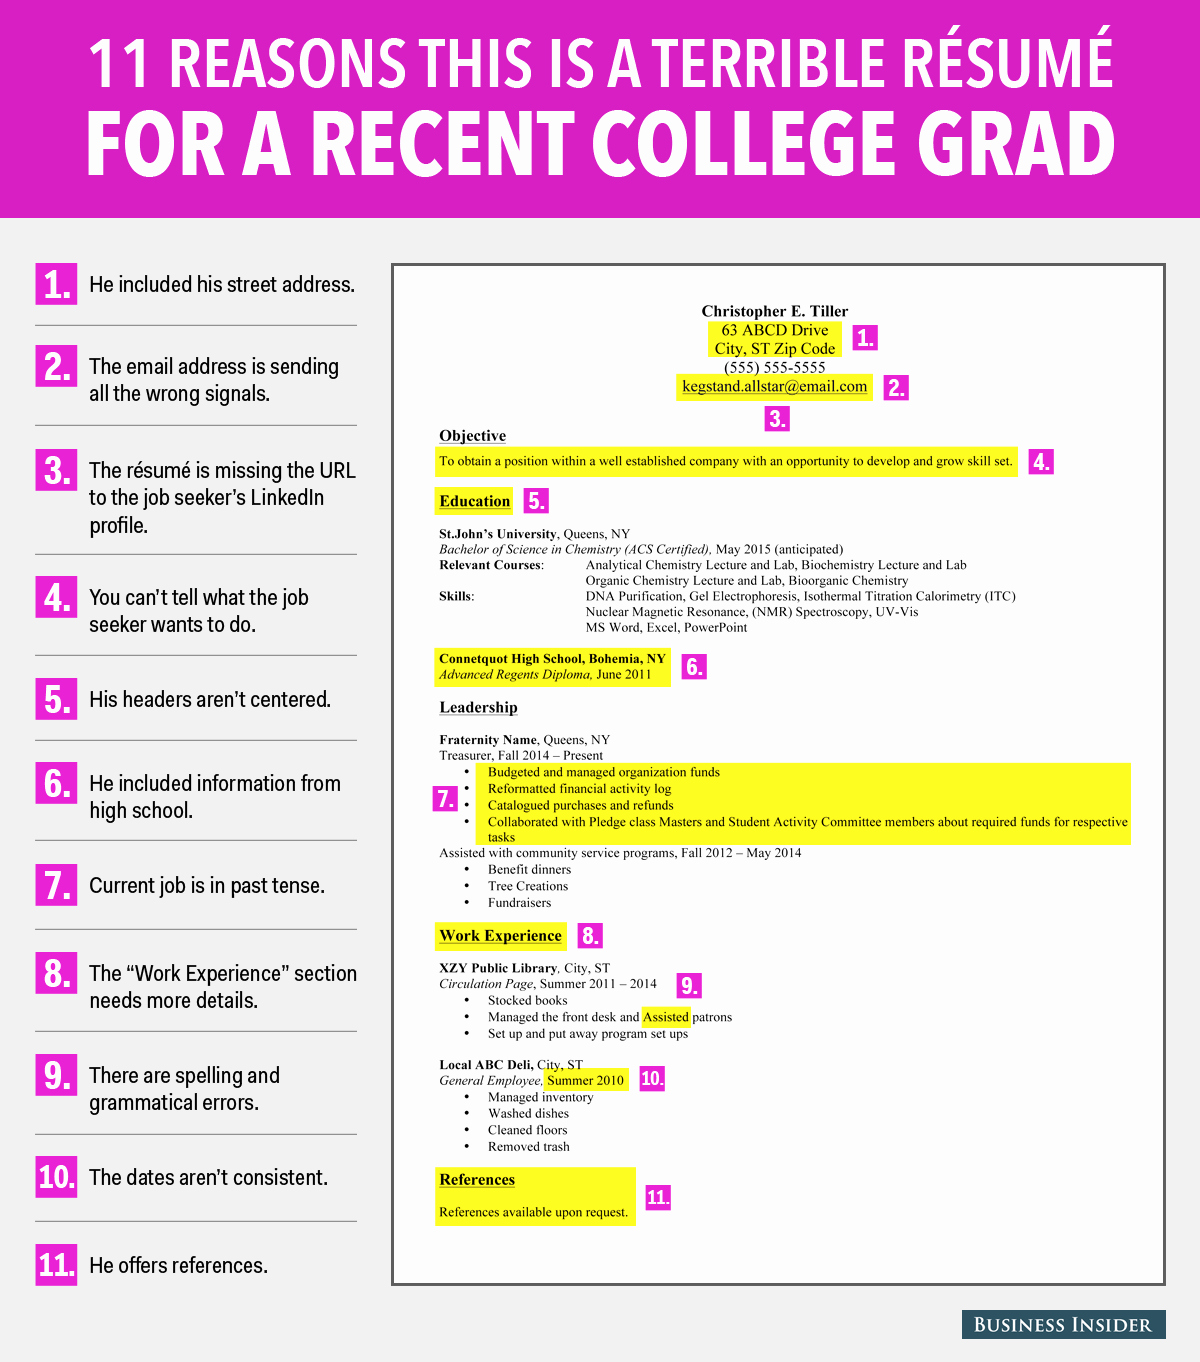 College Graduate Resume Template Unique 11 Reasons This is A Terrible Résumé for A Recent